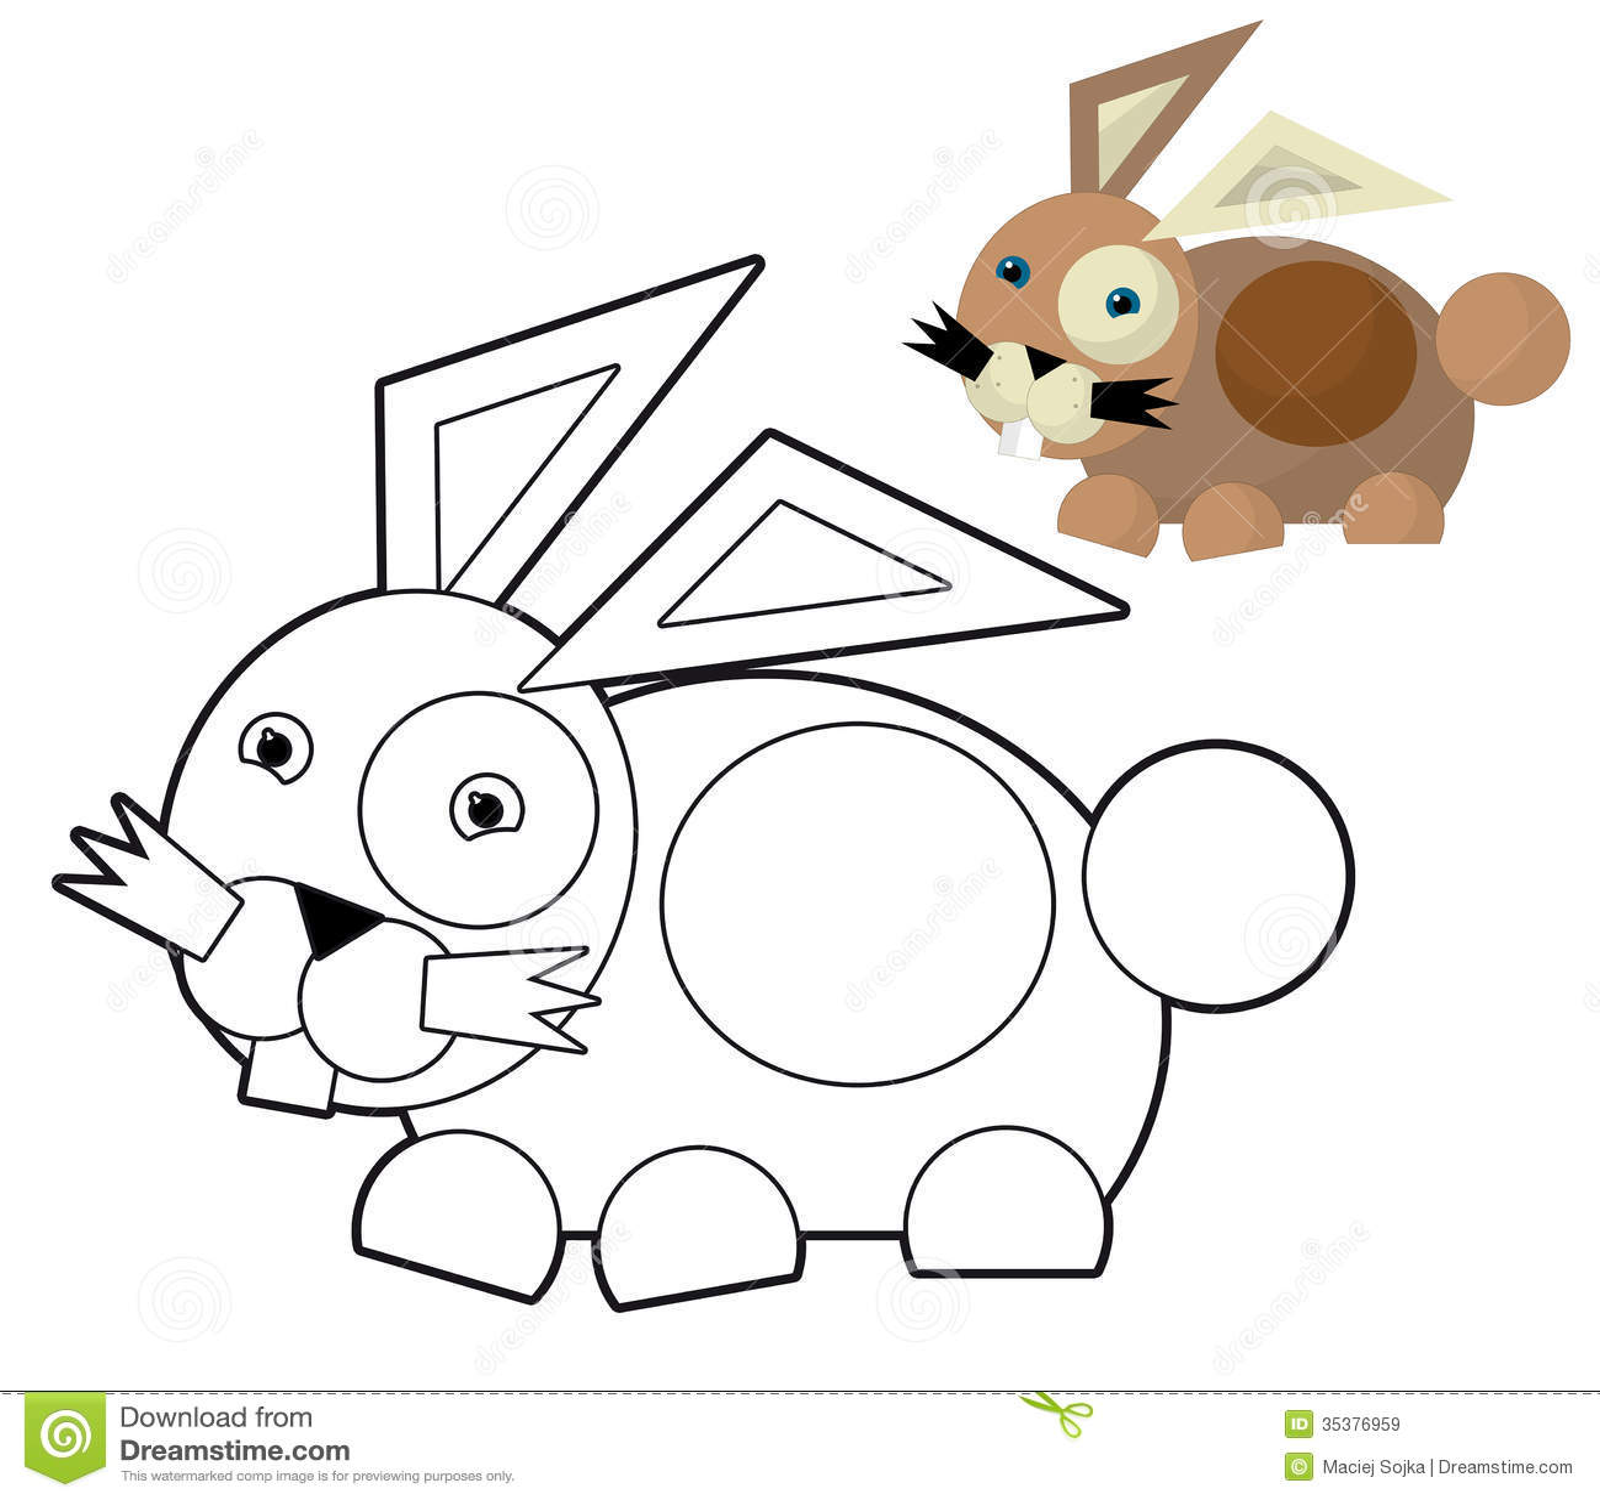 cartoon animal coloring page illustration for the children stock illustration illustration. Black Bedroom Furniture Sets. Home Design Ideas